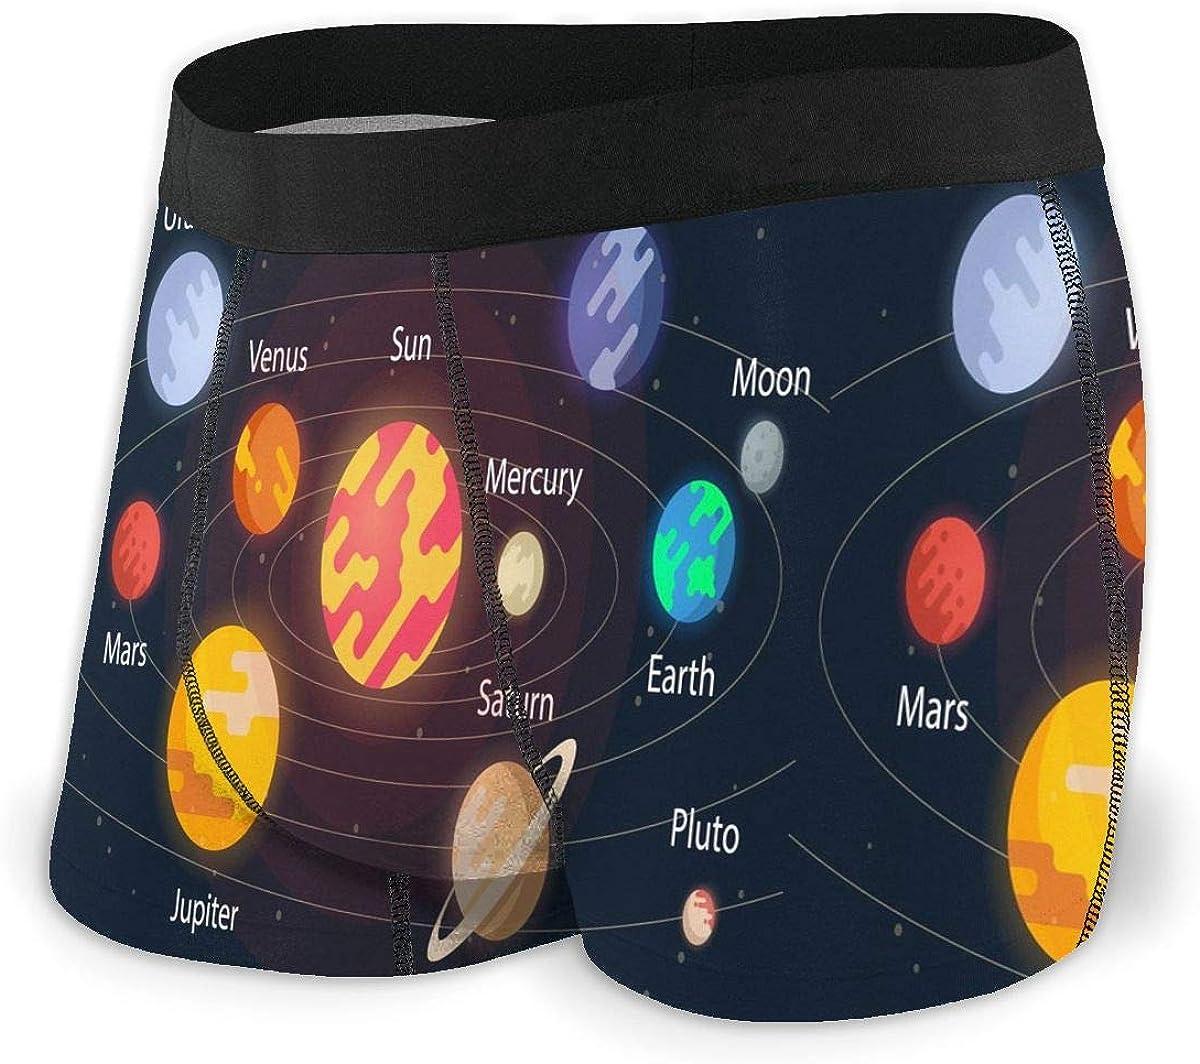 Dujiea Solar System Eight Planet Boxer Briefs for Men Boys Teen Black Men's Cotton Soft Breathable Boxers Underwear